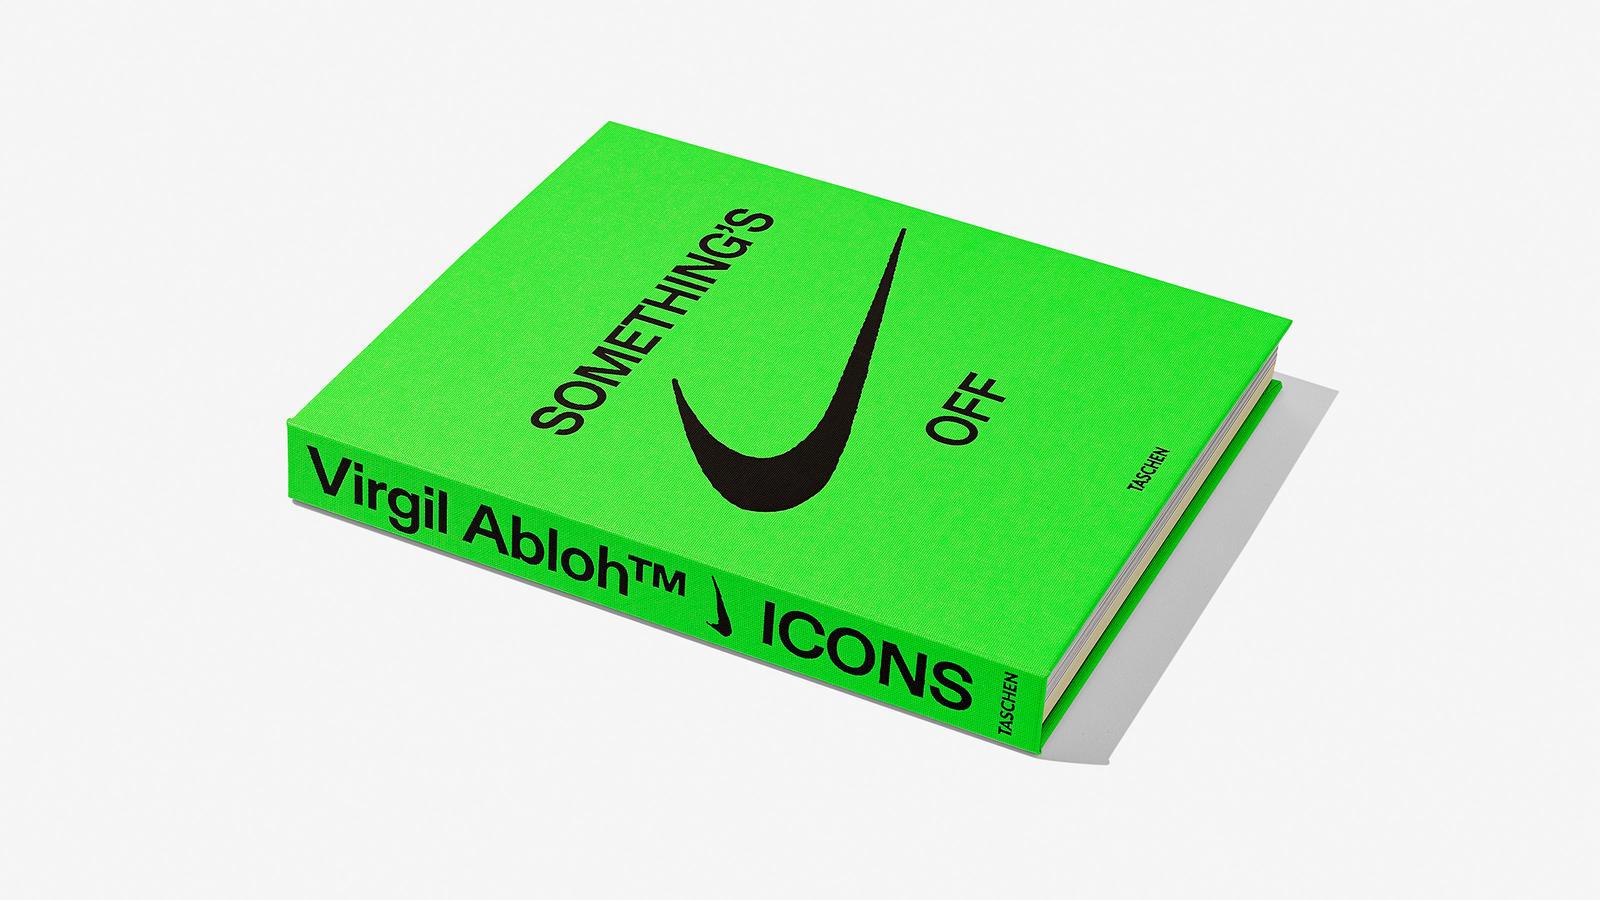 ICON Nike Virgil Abloh libro Taschen